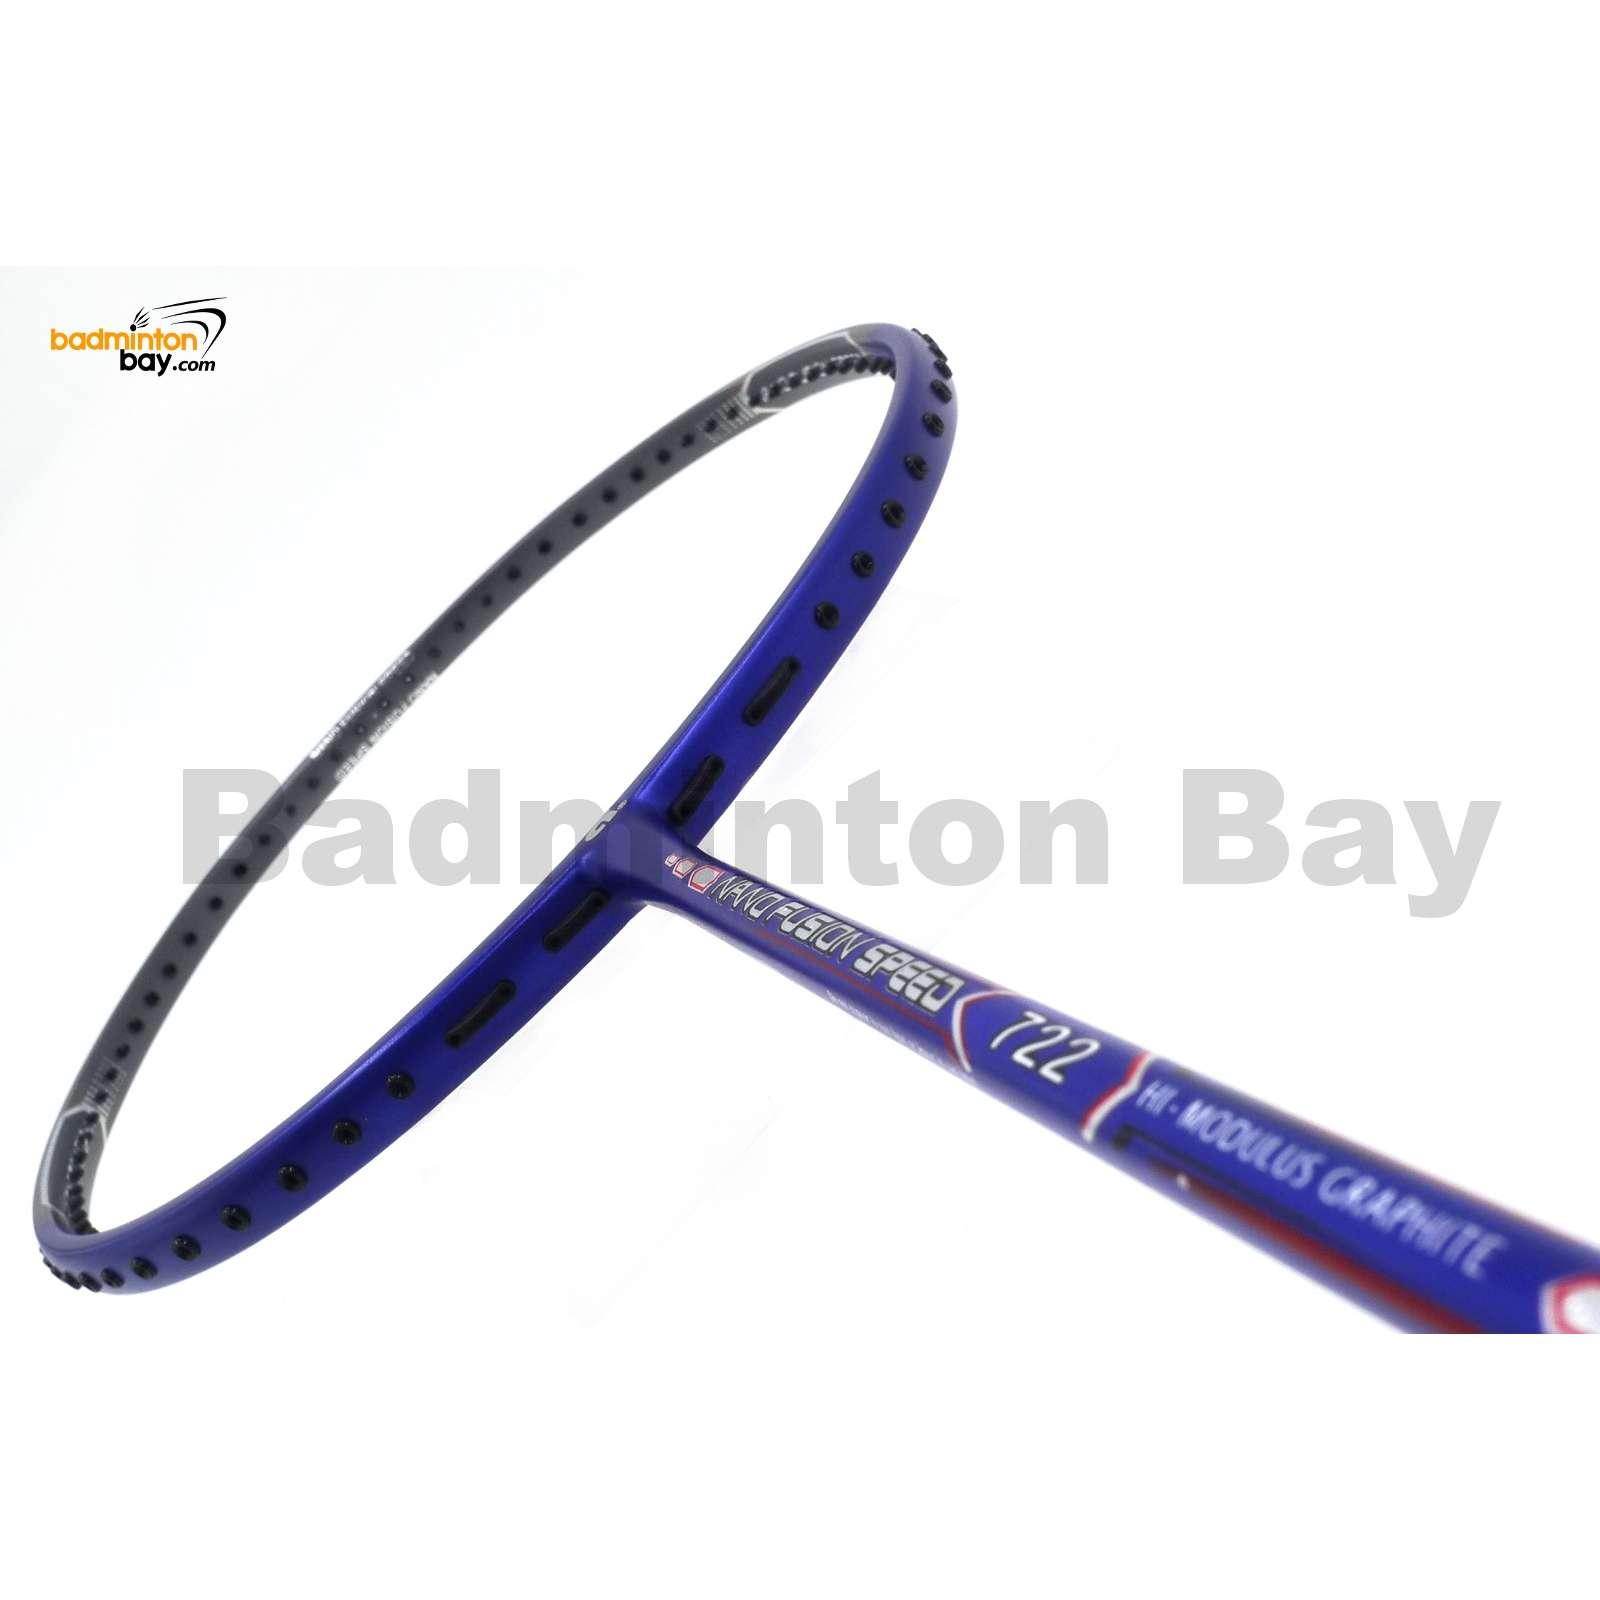 Apacs Nano Fusion Speed 722 Red Badminton Racket